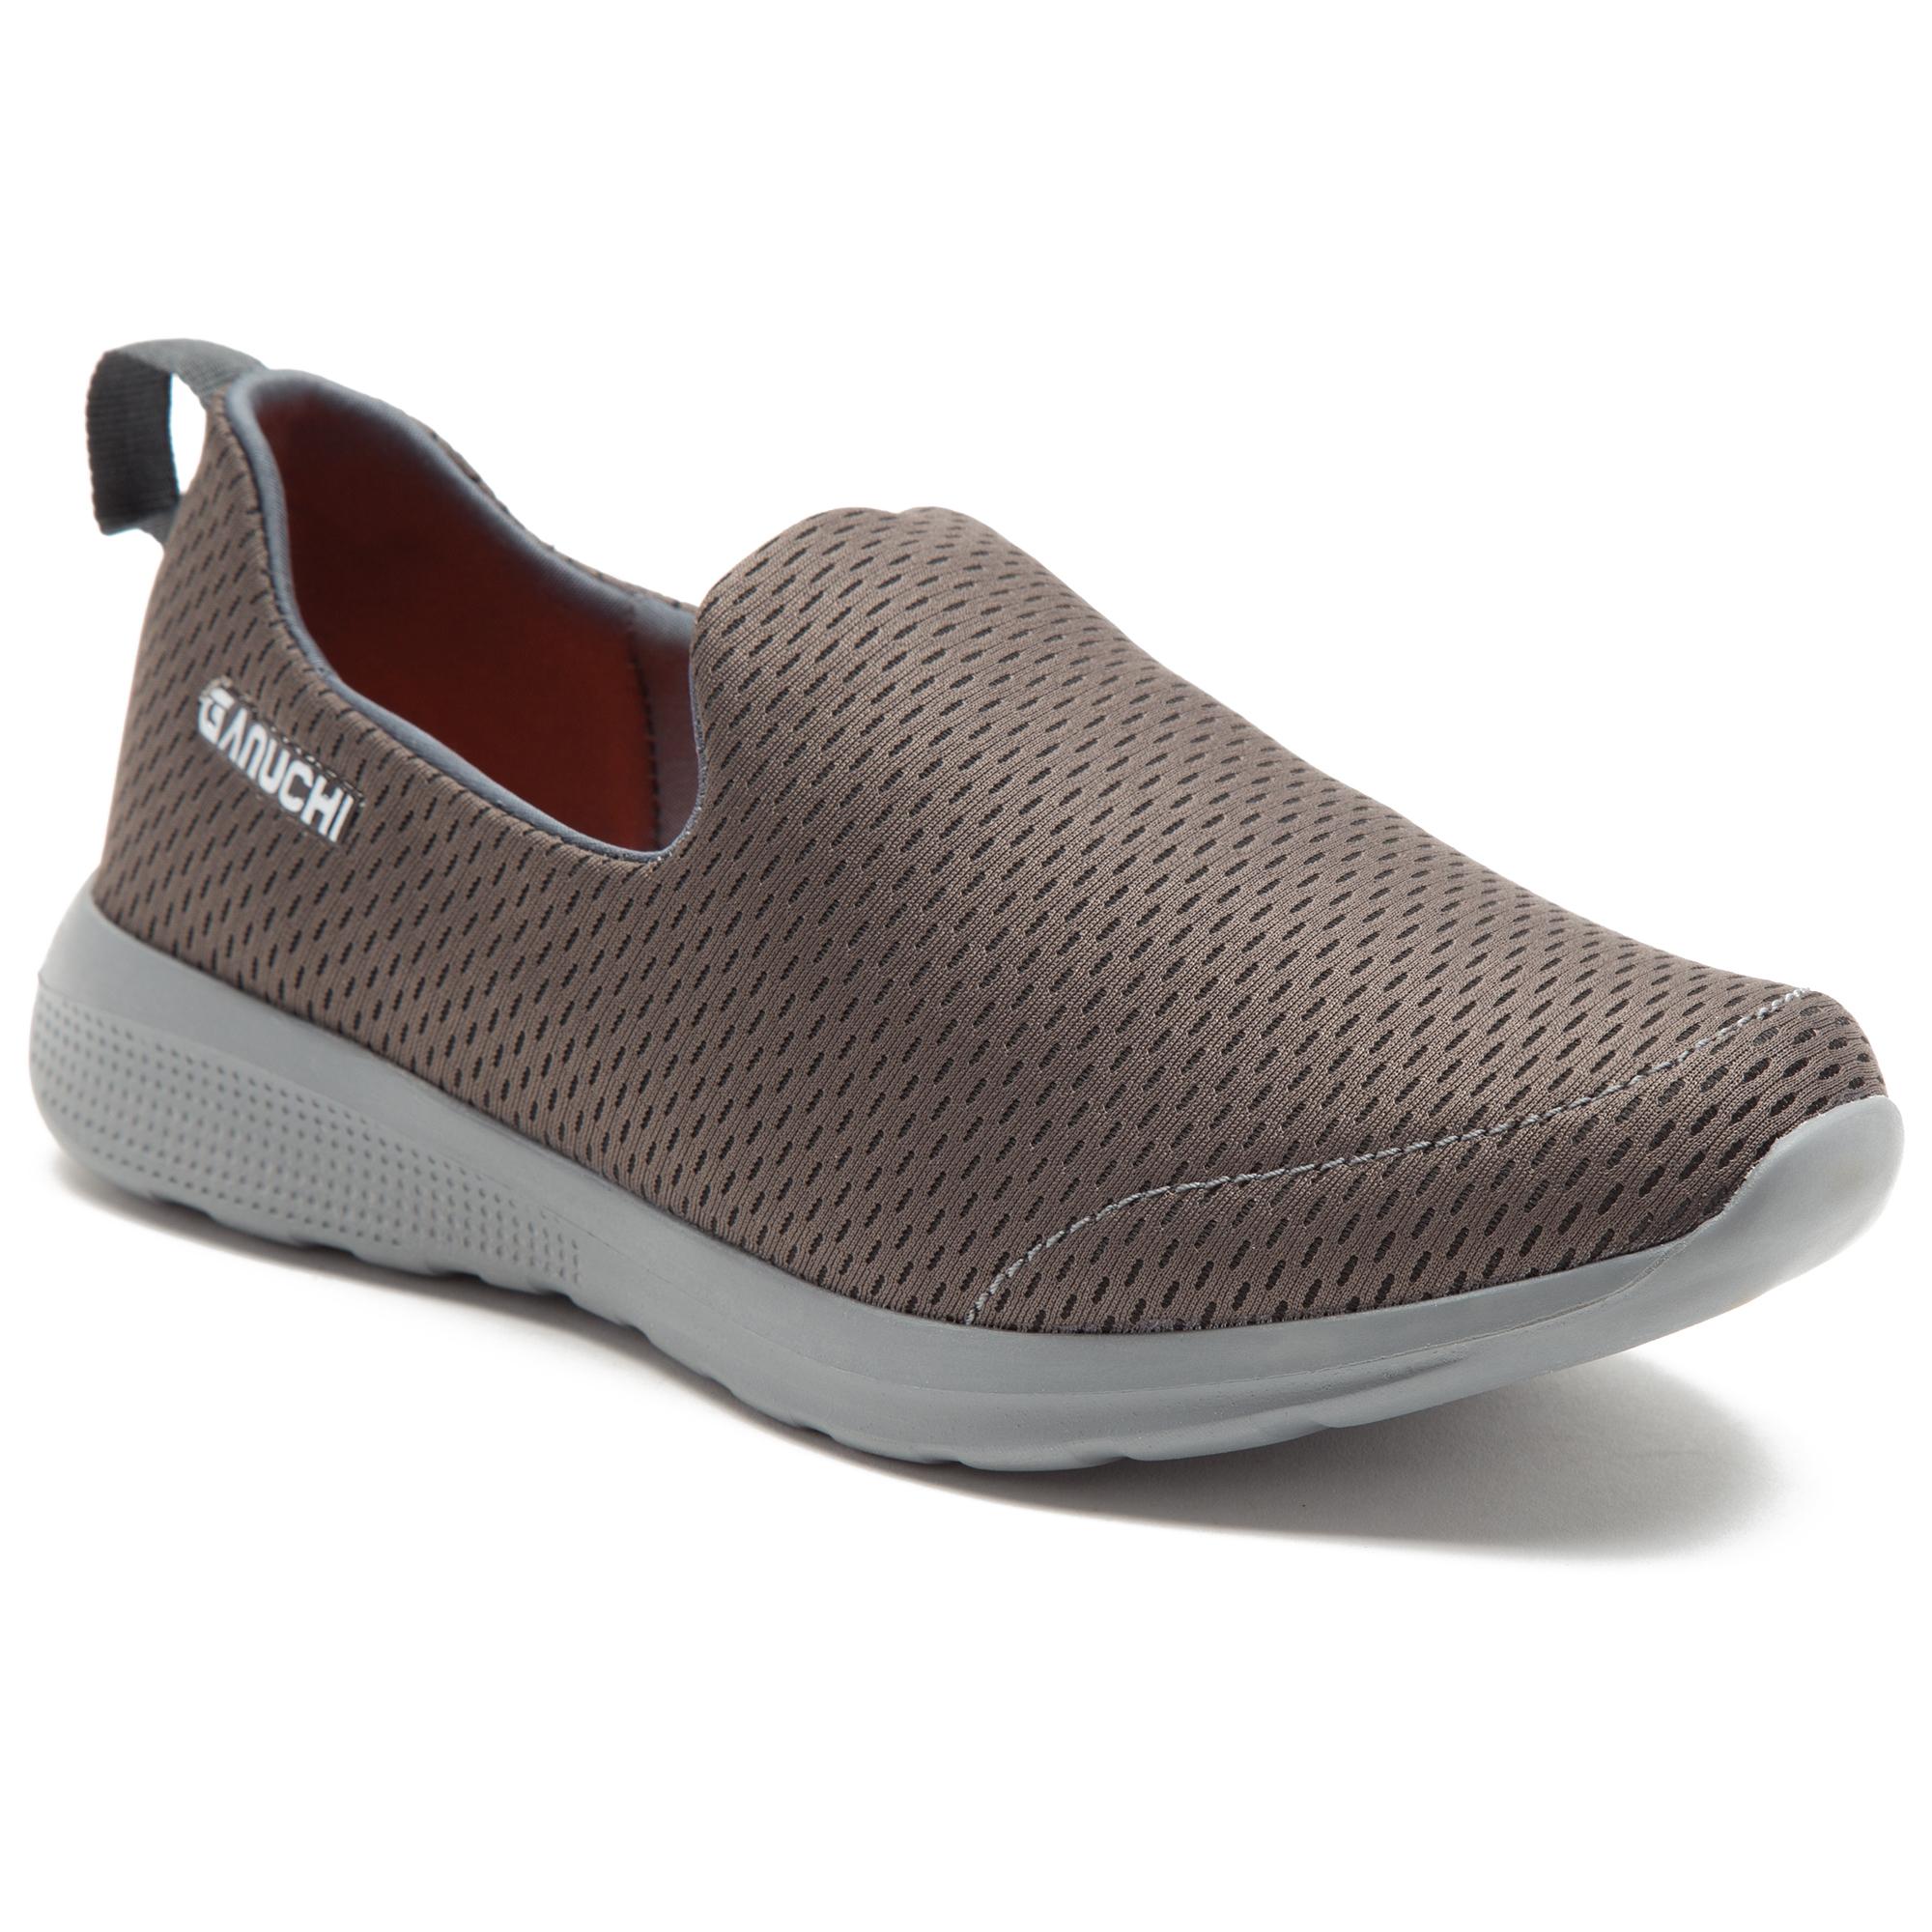 GANUCHI   Ganuchi by Franco Leone Men's Mesh Grey Running Shoes